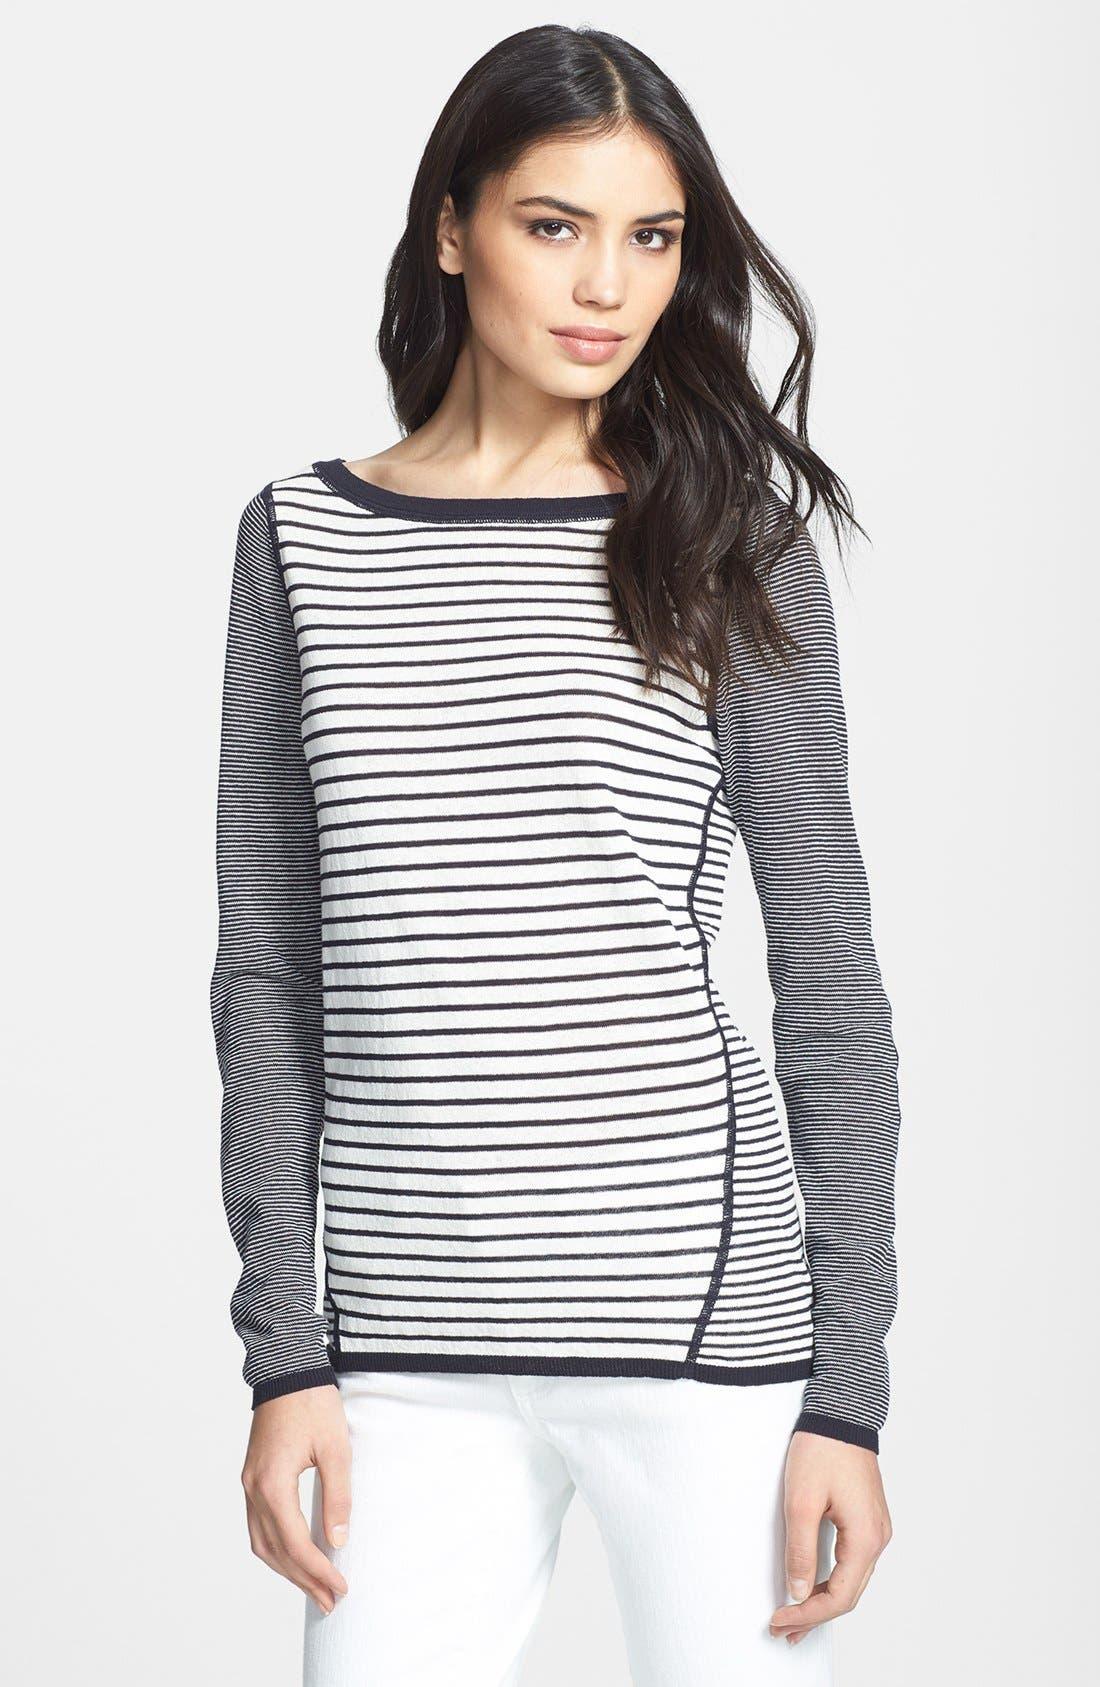 Alternate Image 1 Selected - Tory Burch 'Kamila' Mixed Stripe Sweater